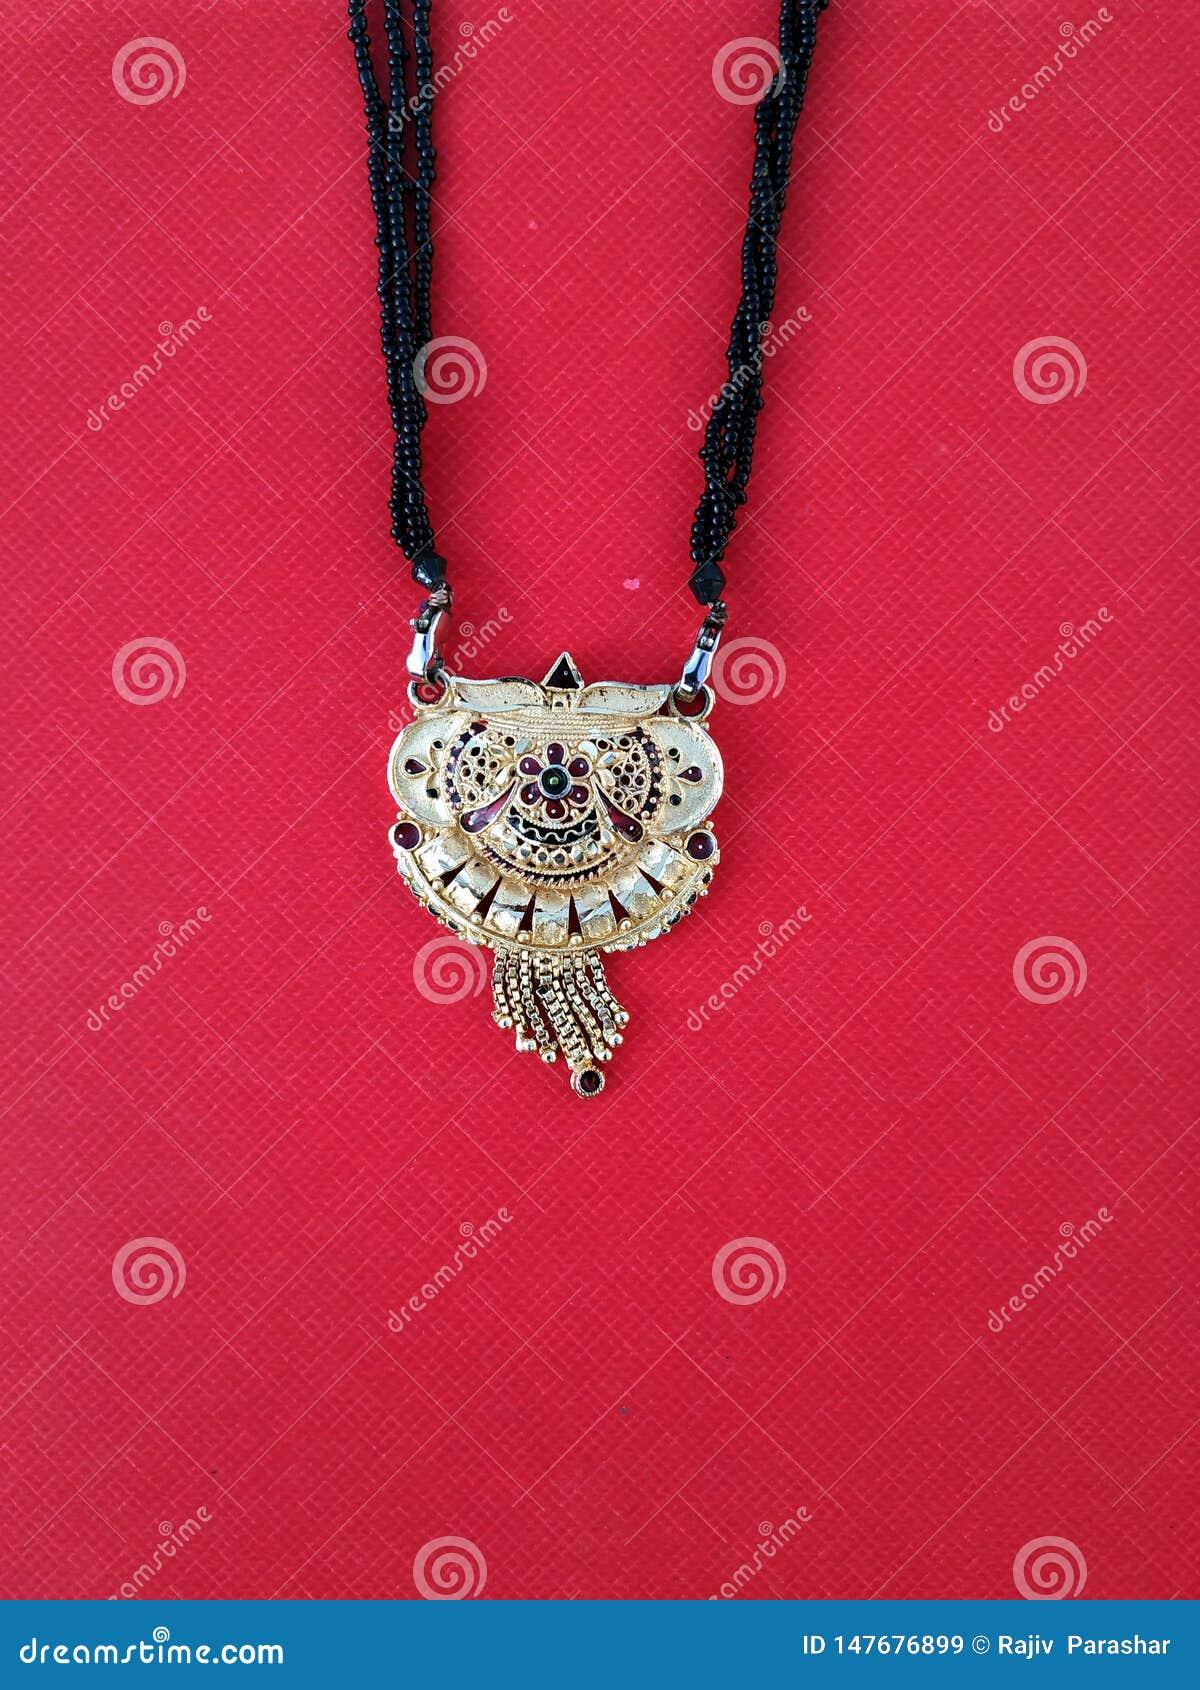 Women`s stylish fashion accessories Leather woman handbag